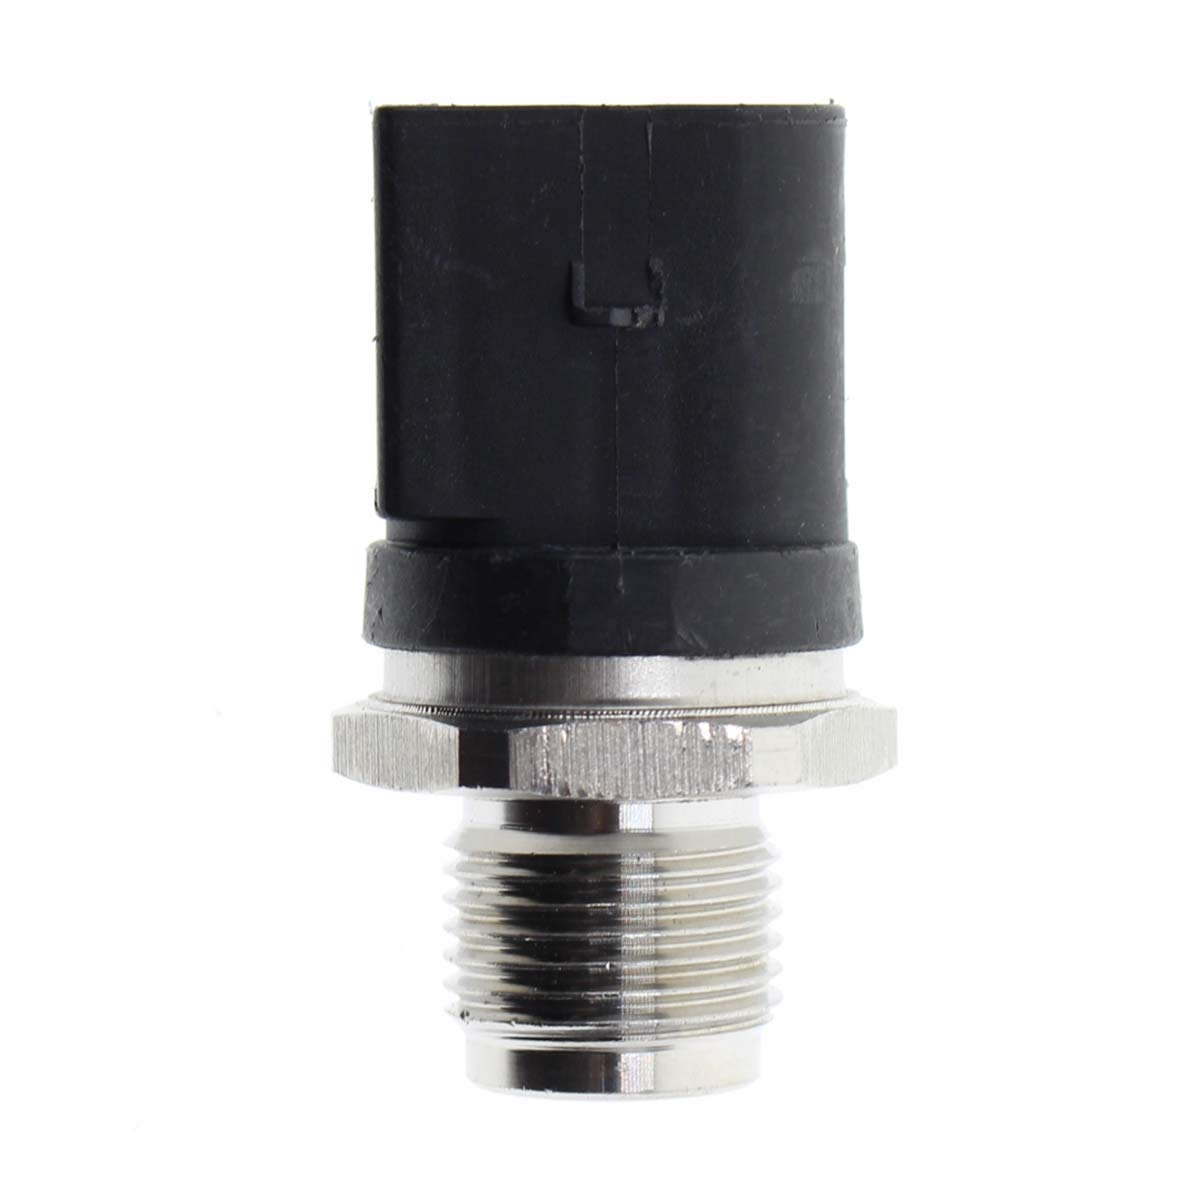 AUTOKAY New Fuel Injection Pressure Sensor for 2005-2009 Dodge Sprinter 2500 0041536728